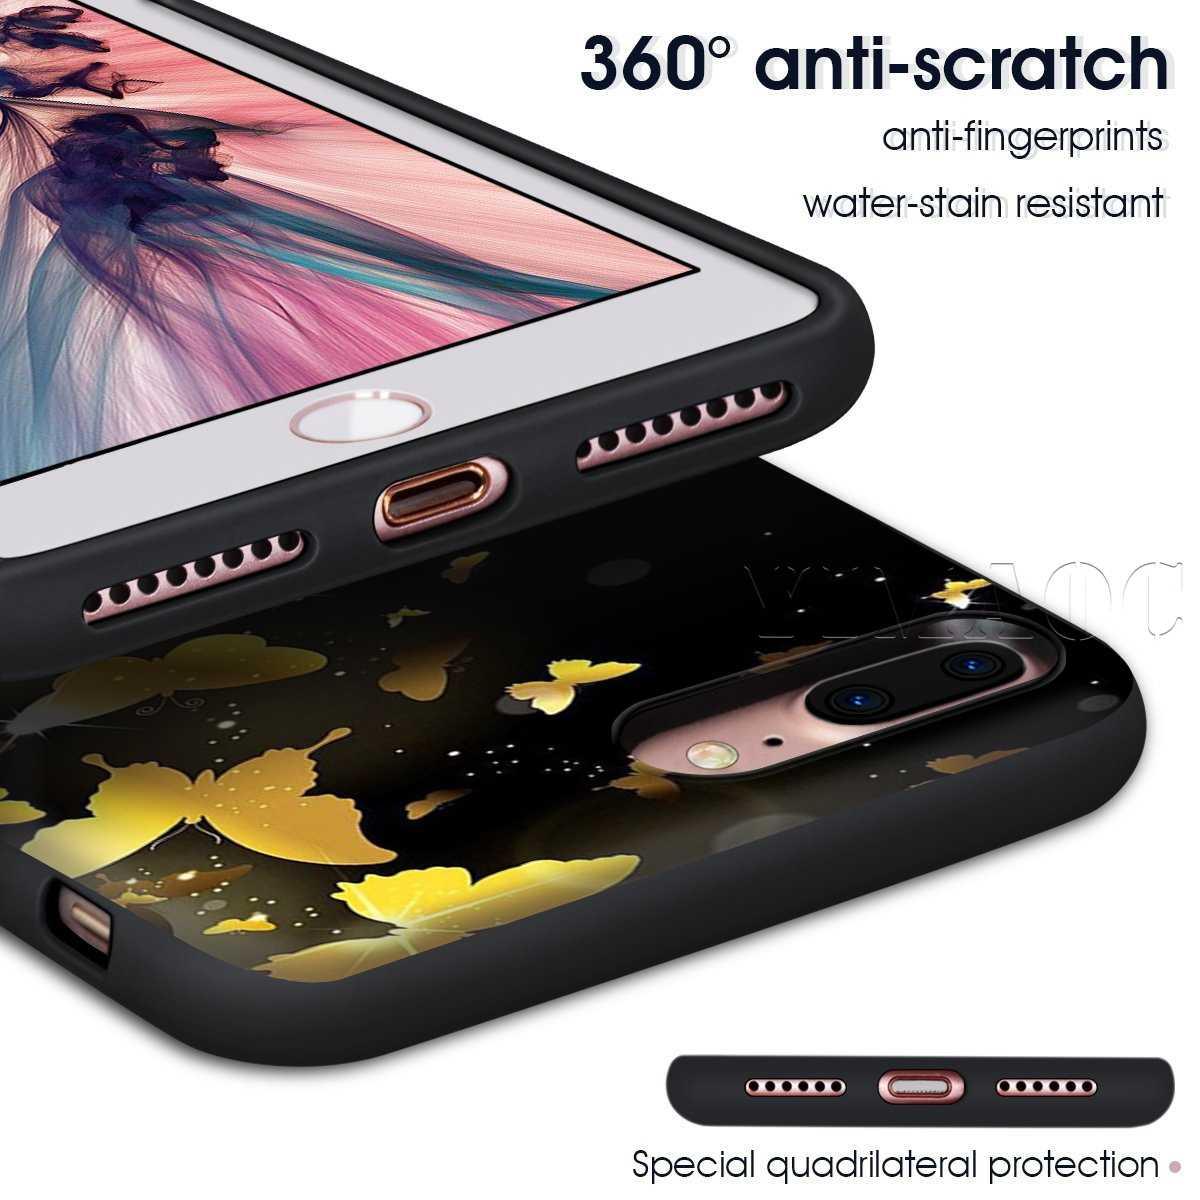 YIMAOC Наруто Гаара силиконовый мягкий чехол для iPhone 11 Pro XS Max XR X 8 7 6 6S Plus 5 5S SE